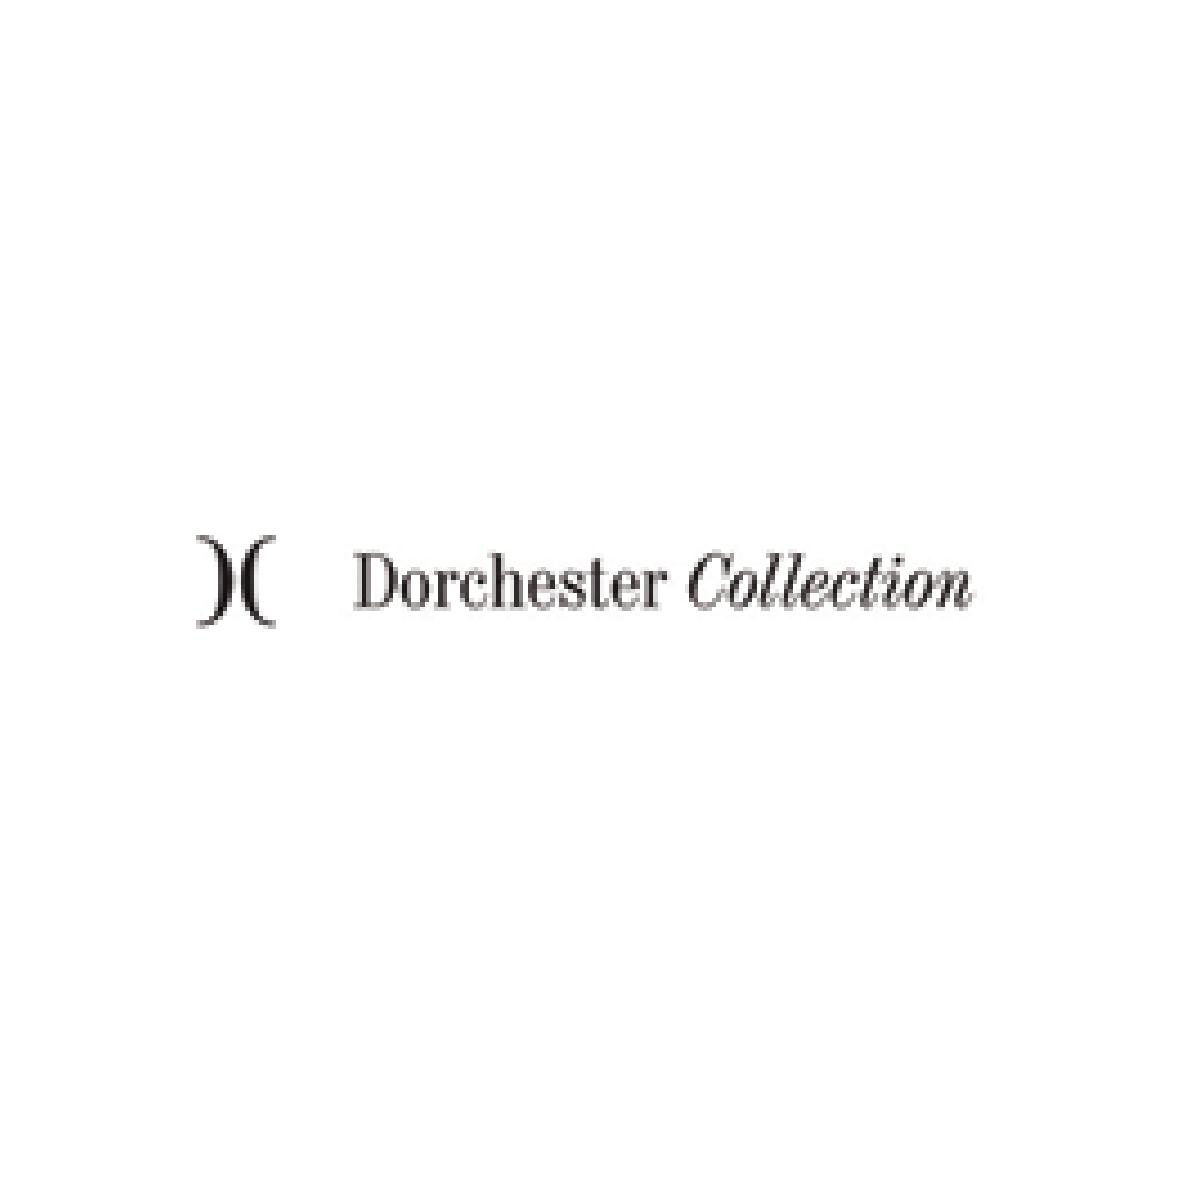 DorchesterCollection.png